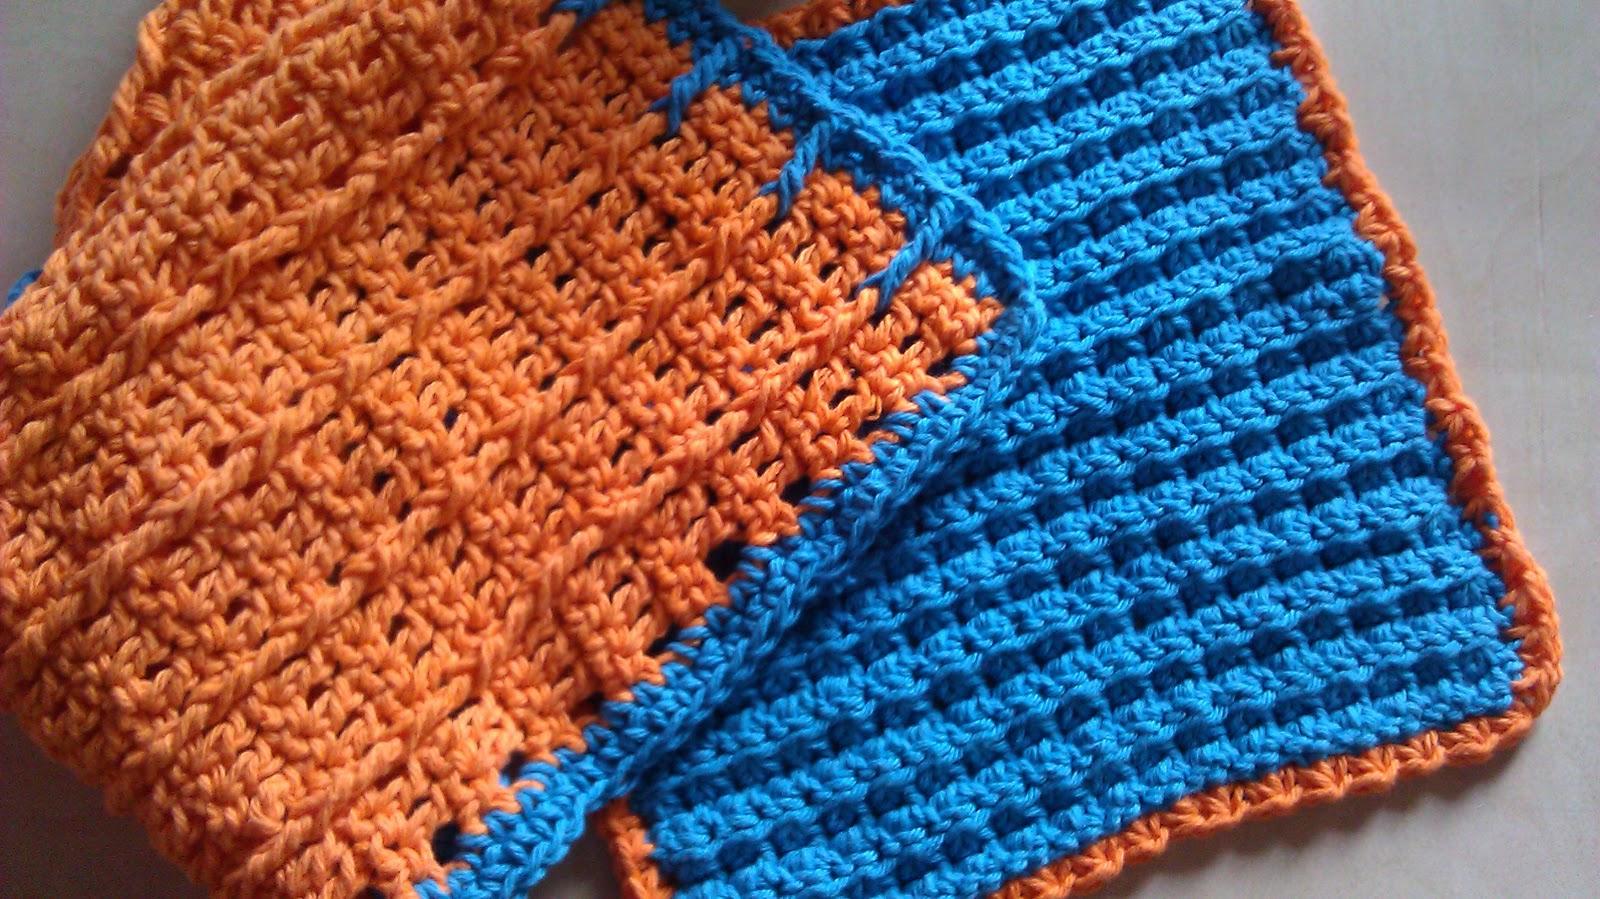 Crochet Baby Washcloth Pattern : Rita Hutcheson-Cobbs: Crochet 3-in-1 Stitch Washcloth and ...